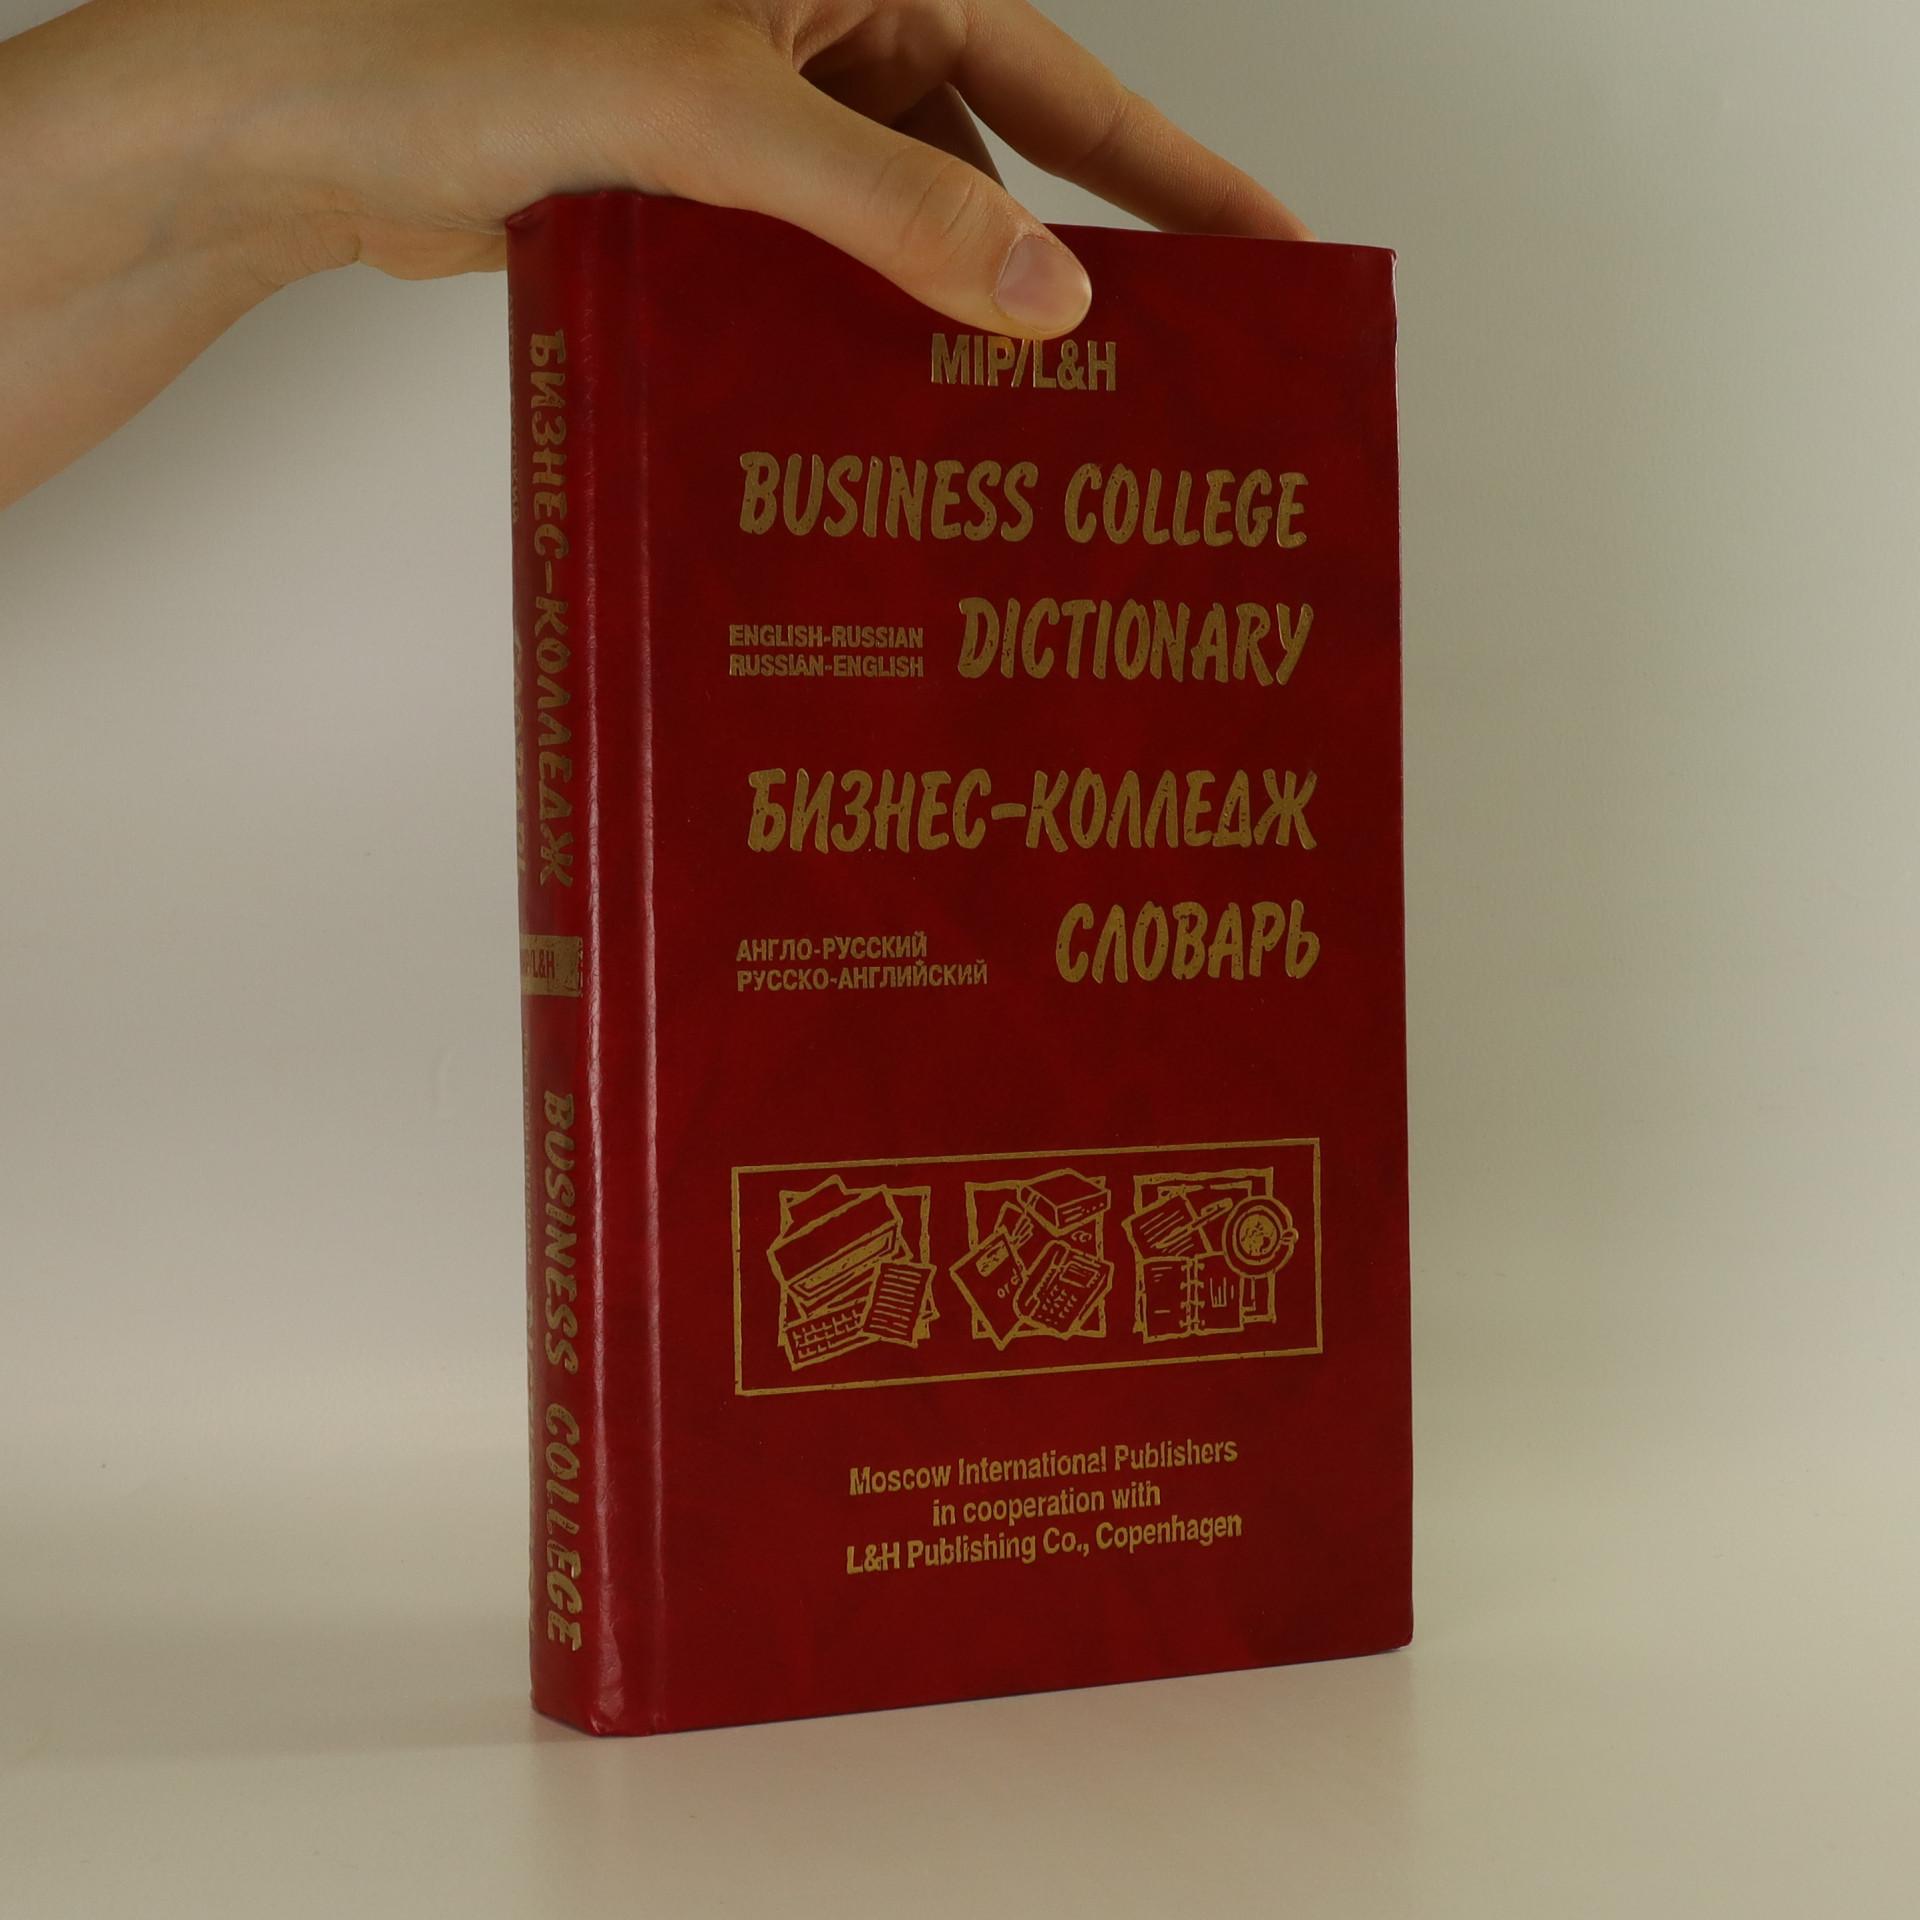 antikvární kniha Business college dictionary, neuveden